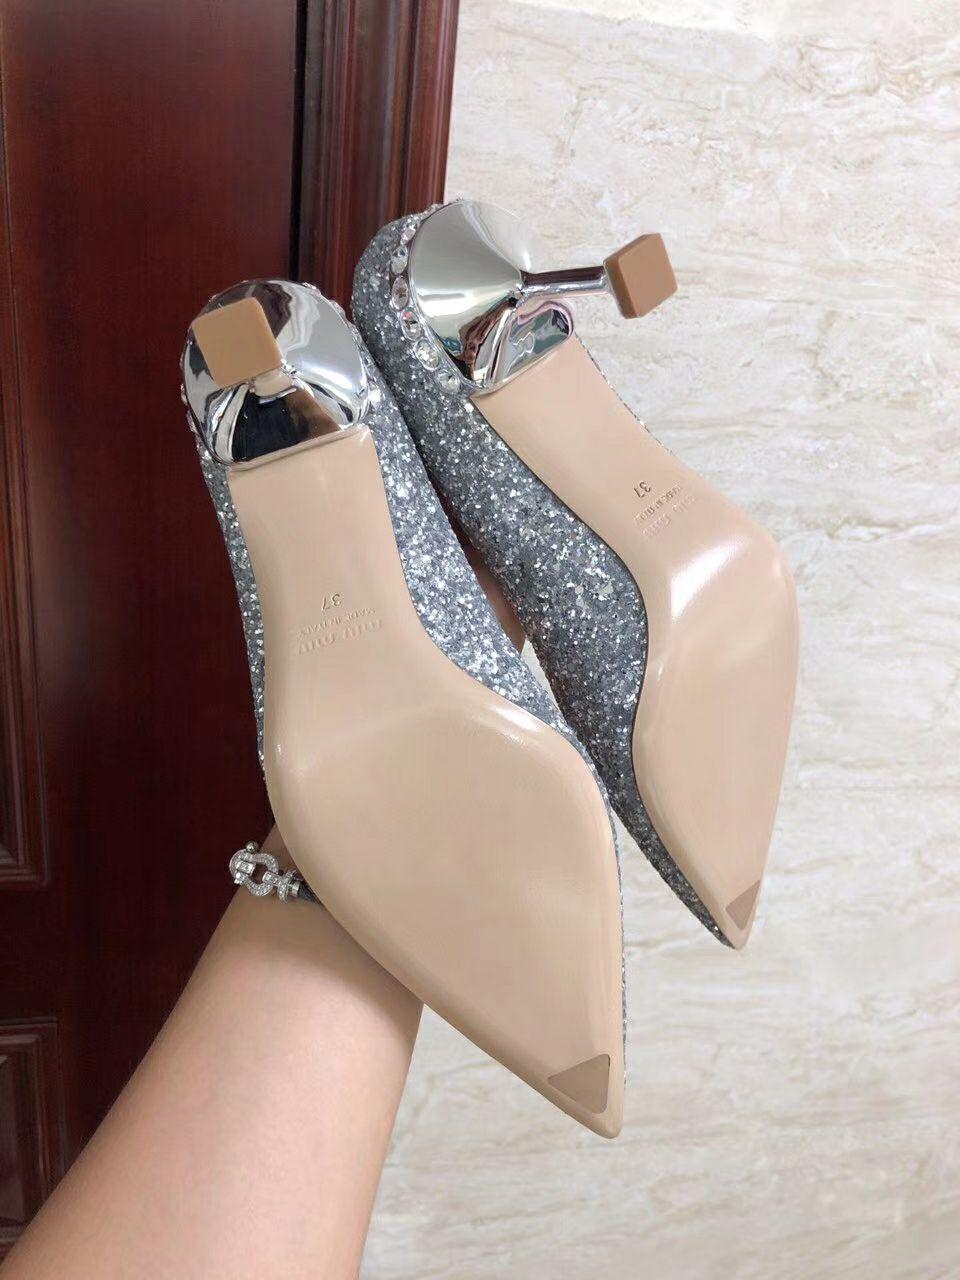 MIU MIU GLITTER FABRIC PUMPS 85 mm heel with crystals SI  ER  4